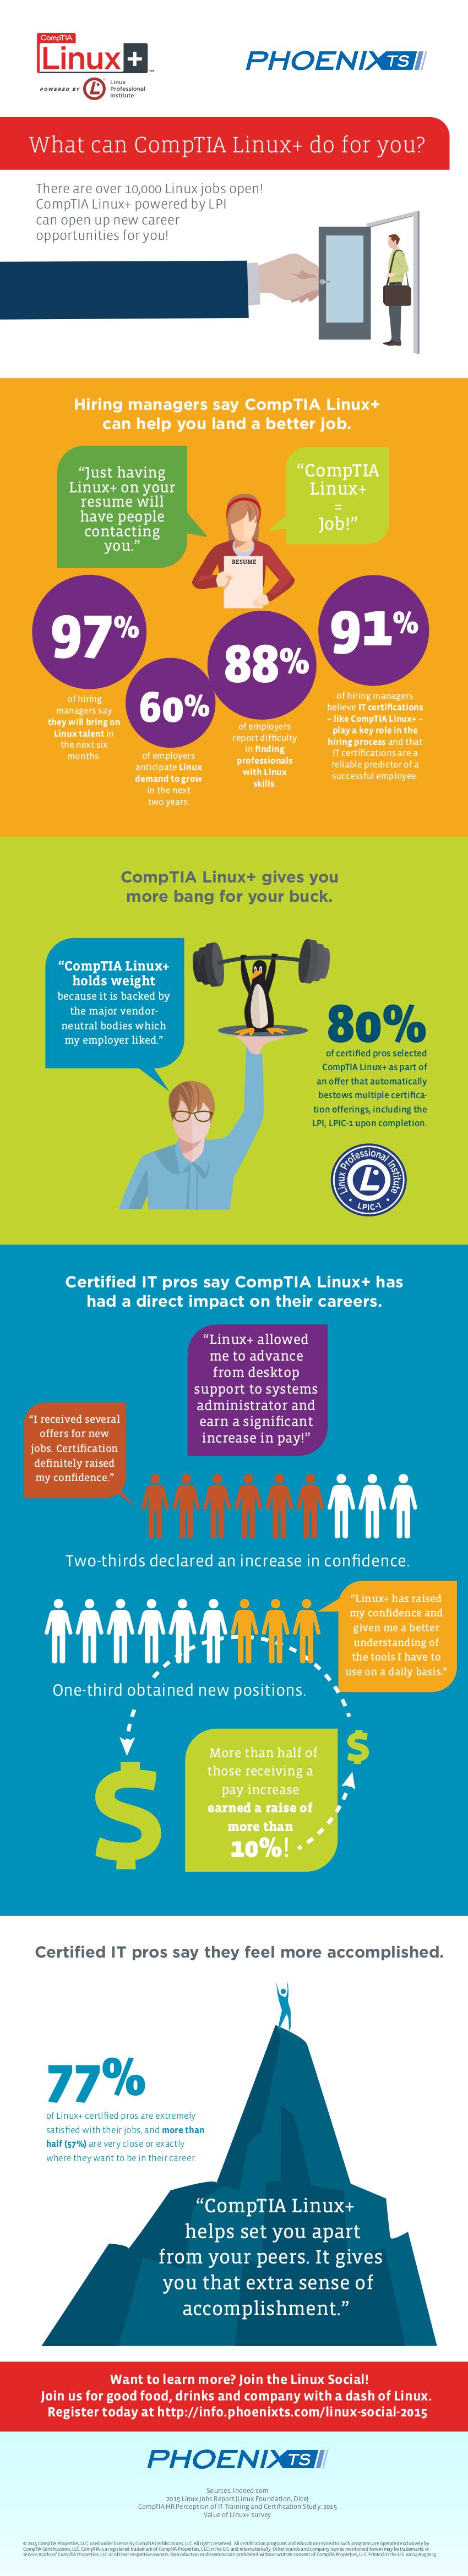 linuxplus-infographic